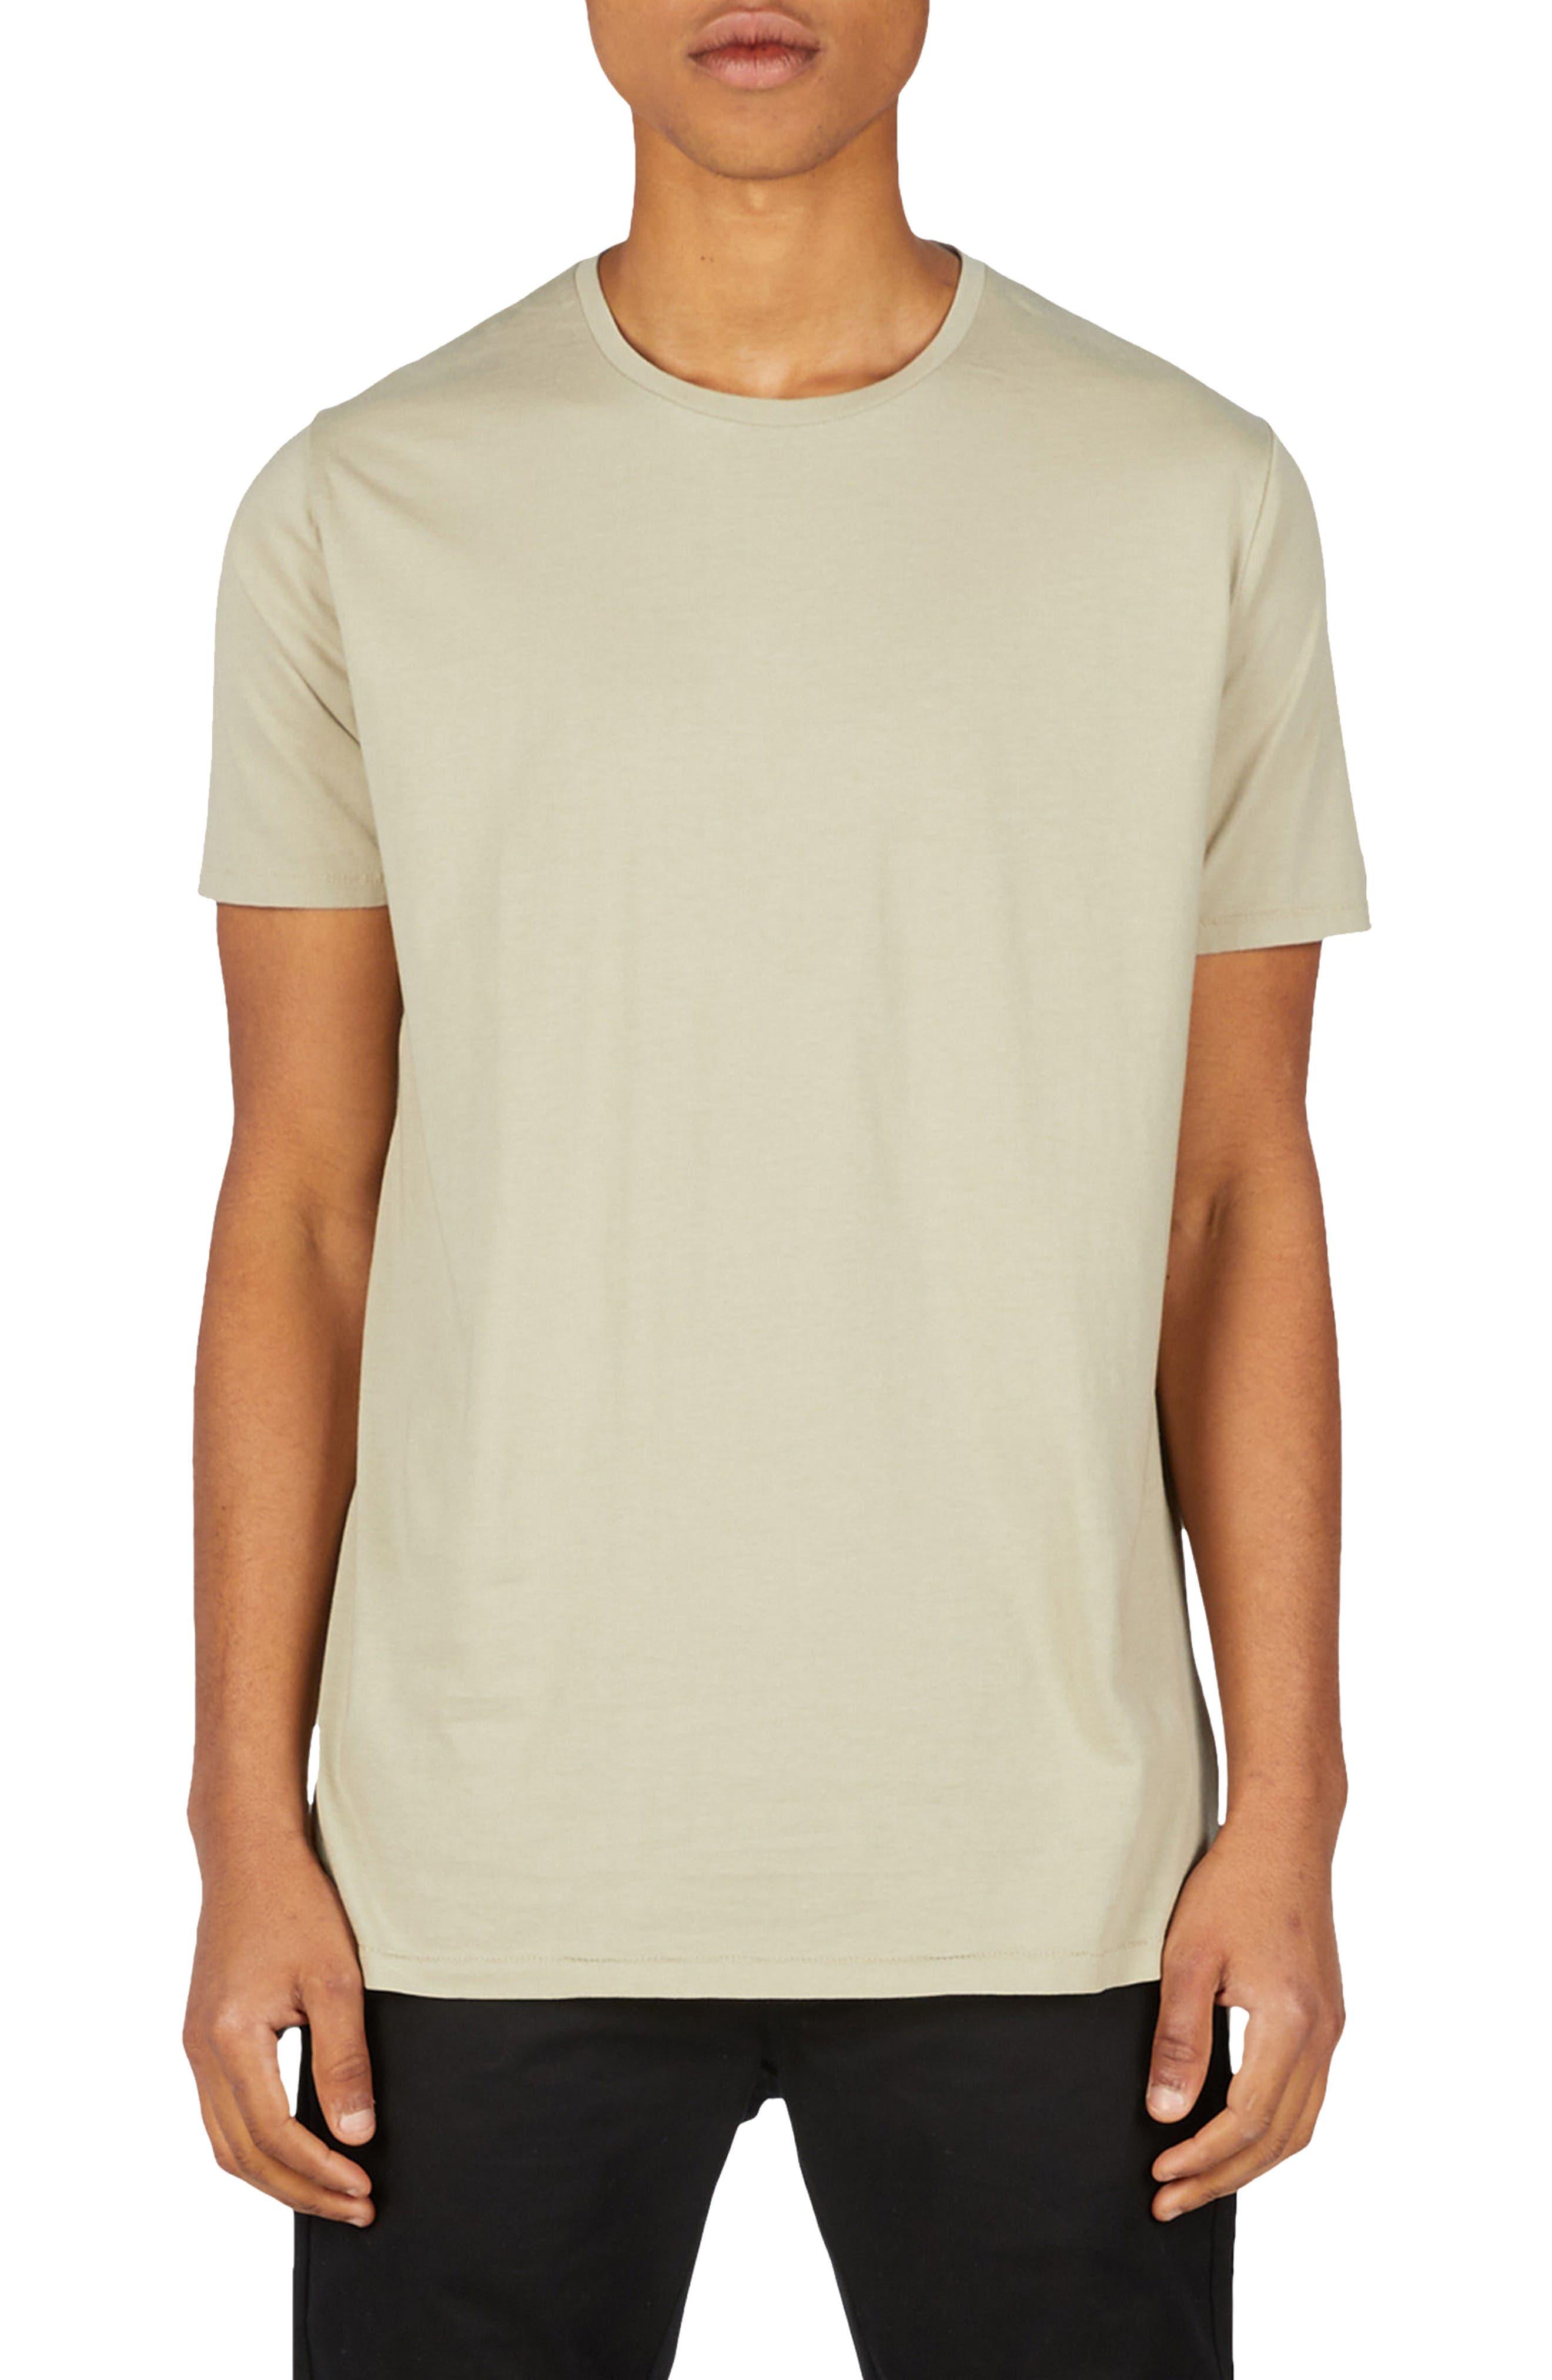 Flintlock T-Shirt,                             Main thumbnail 1, color,                             MOSS